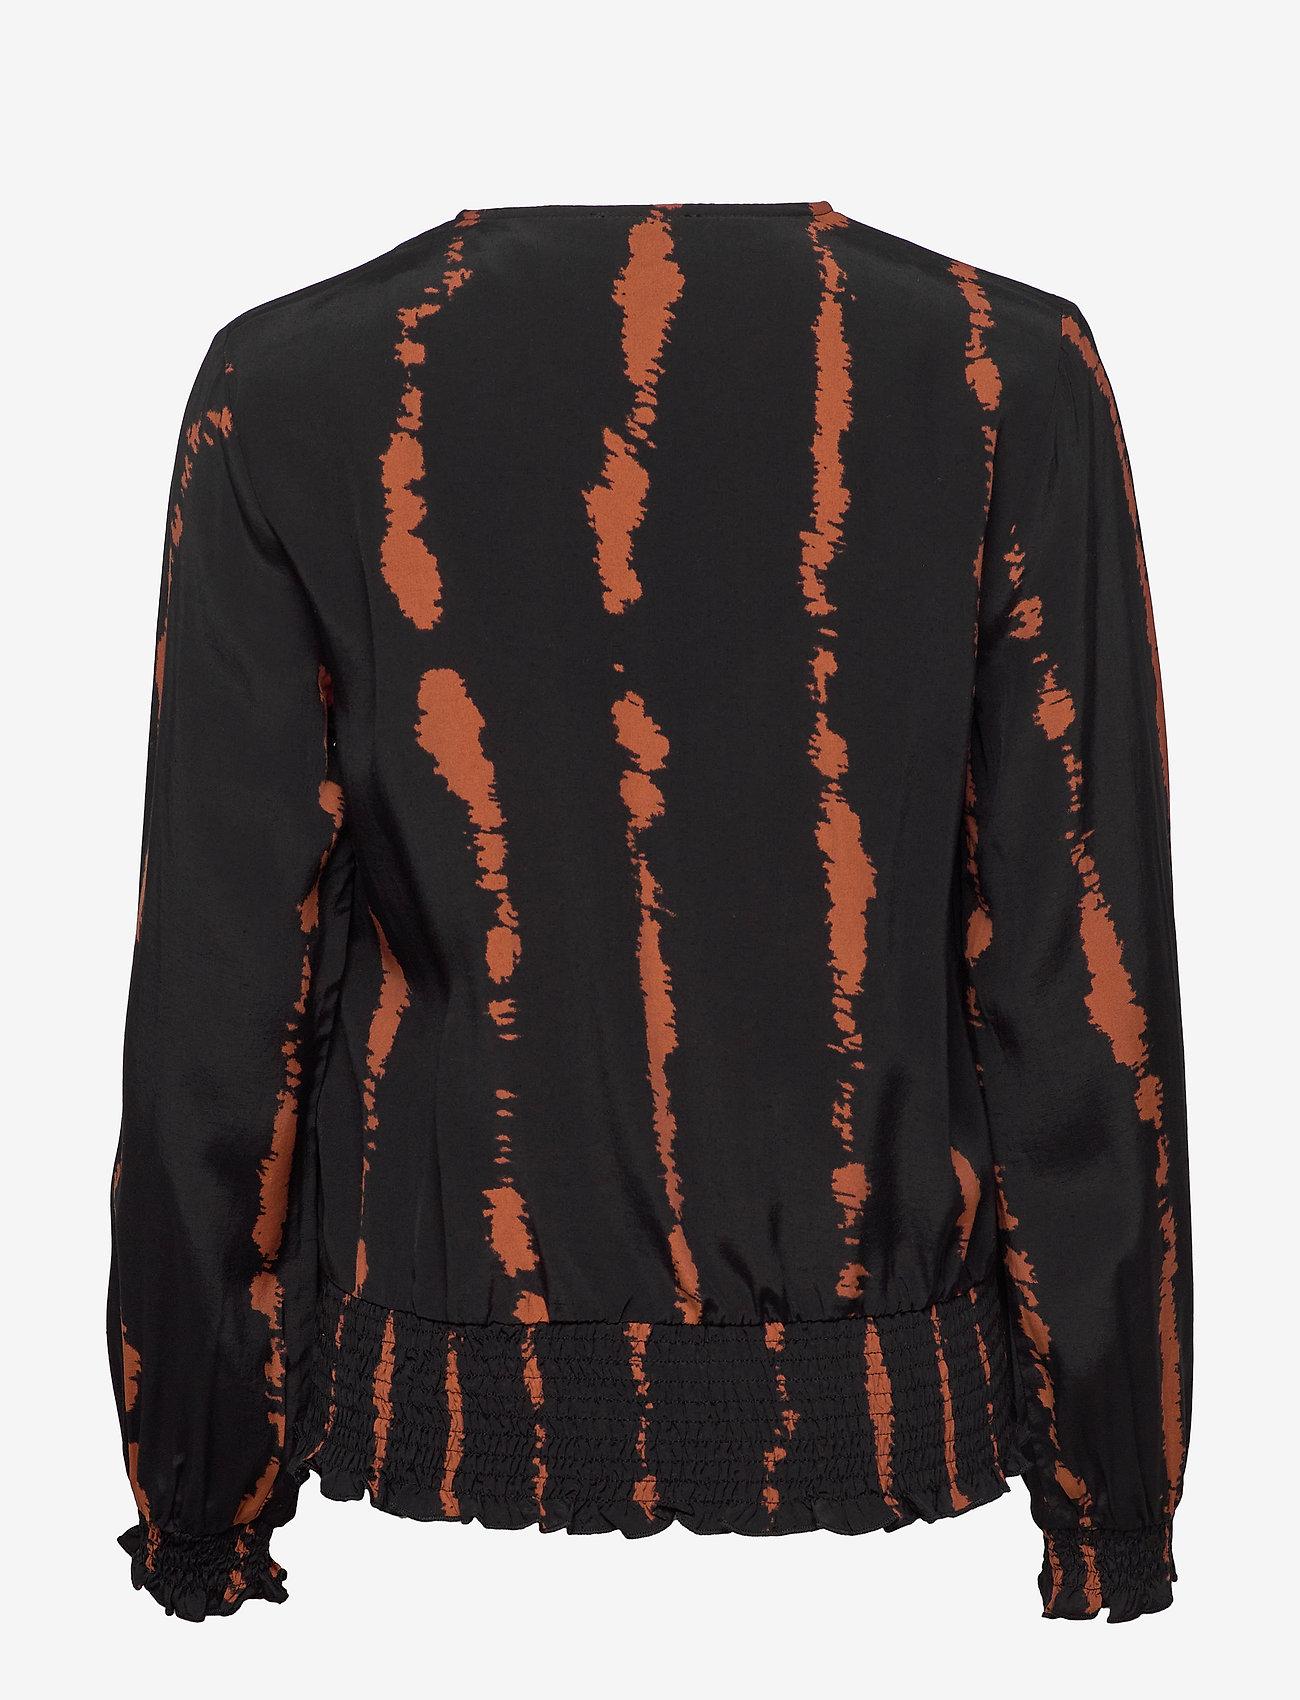 Vally Blouse (Brown Sugar Tie Dye Print) - Minus wEtQ7C